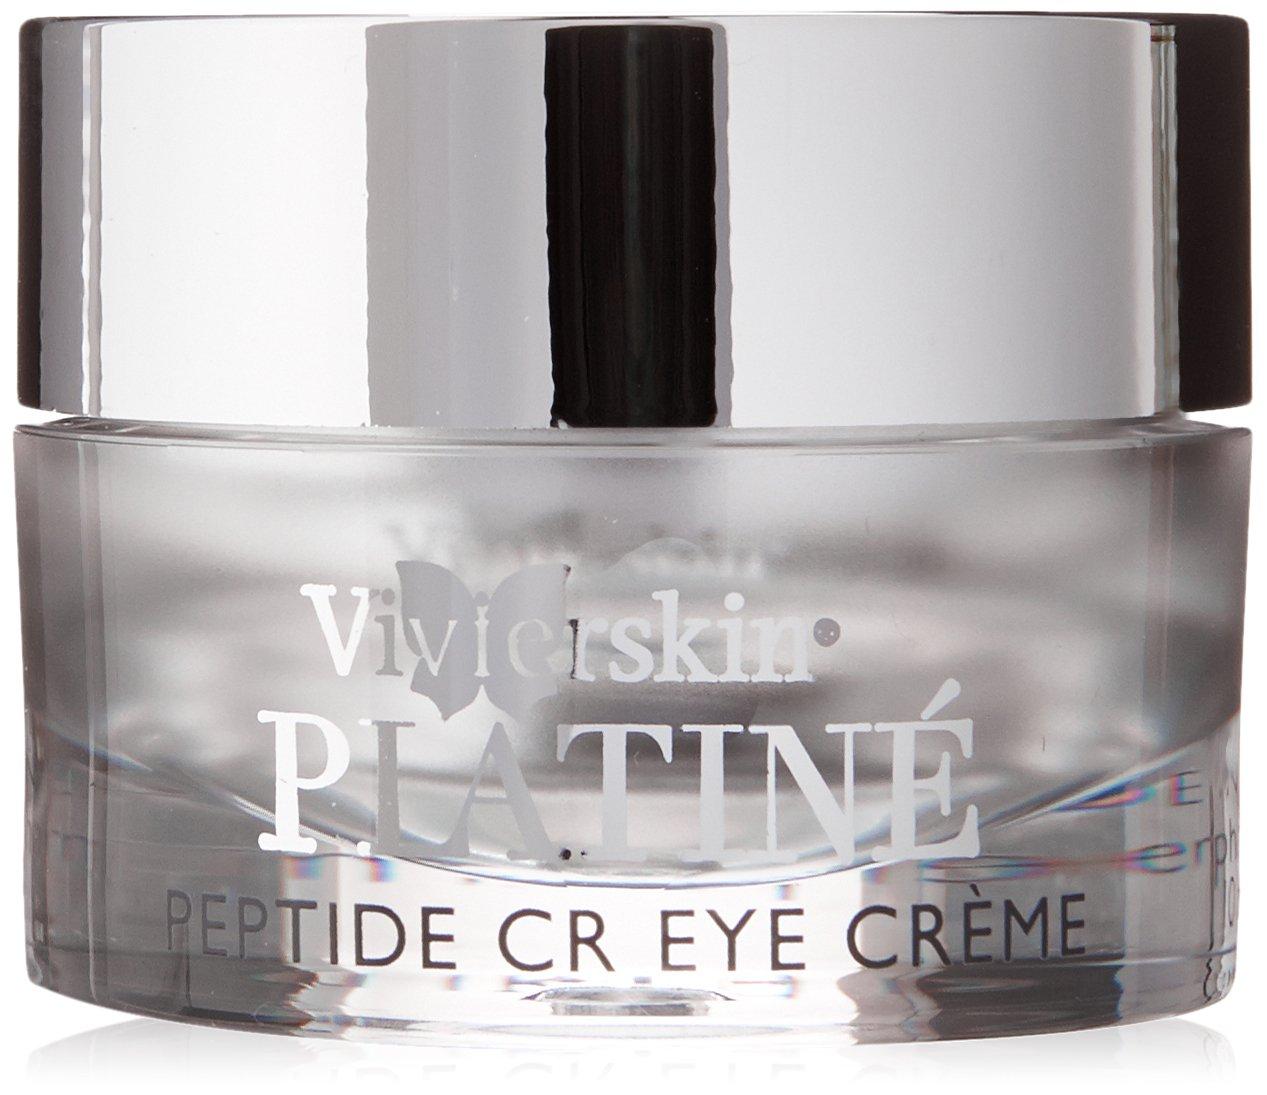 VivierSkin Platin Peptide CR Eye Creme, 0.3 Fluid Ounce